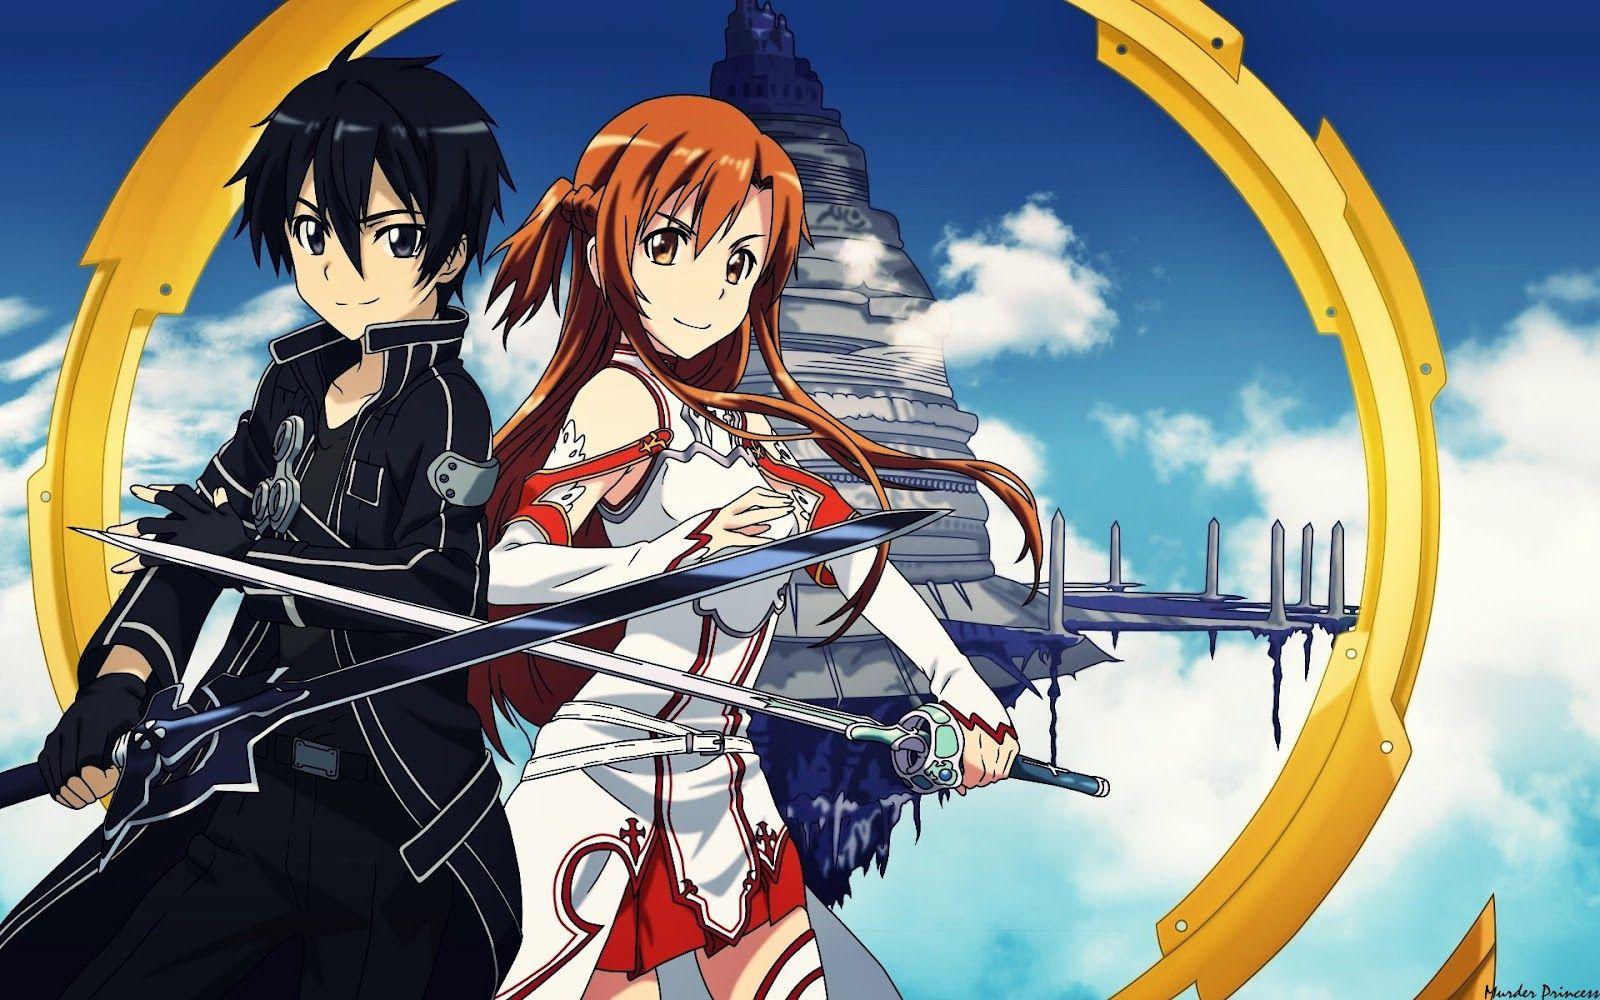 Manga and Anime maniac Sword Art Online Anime Fall into a